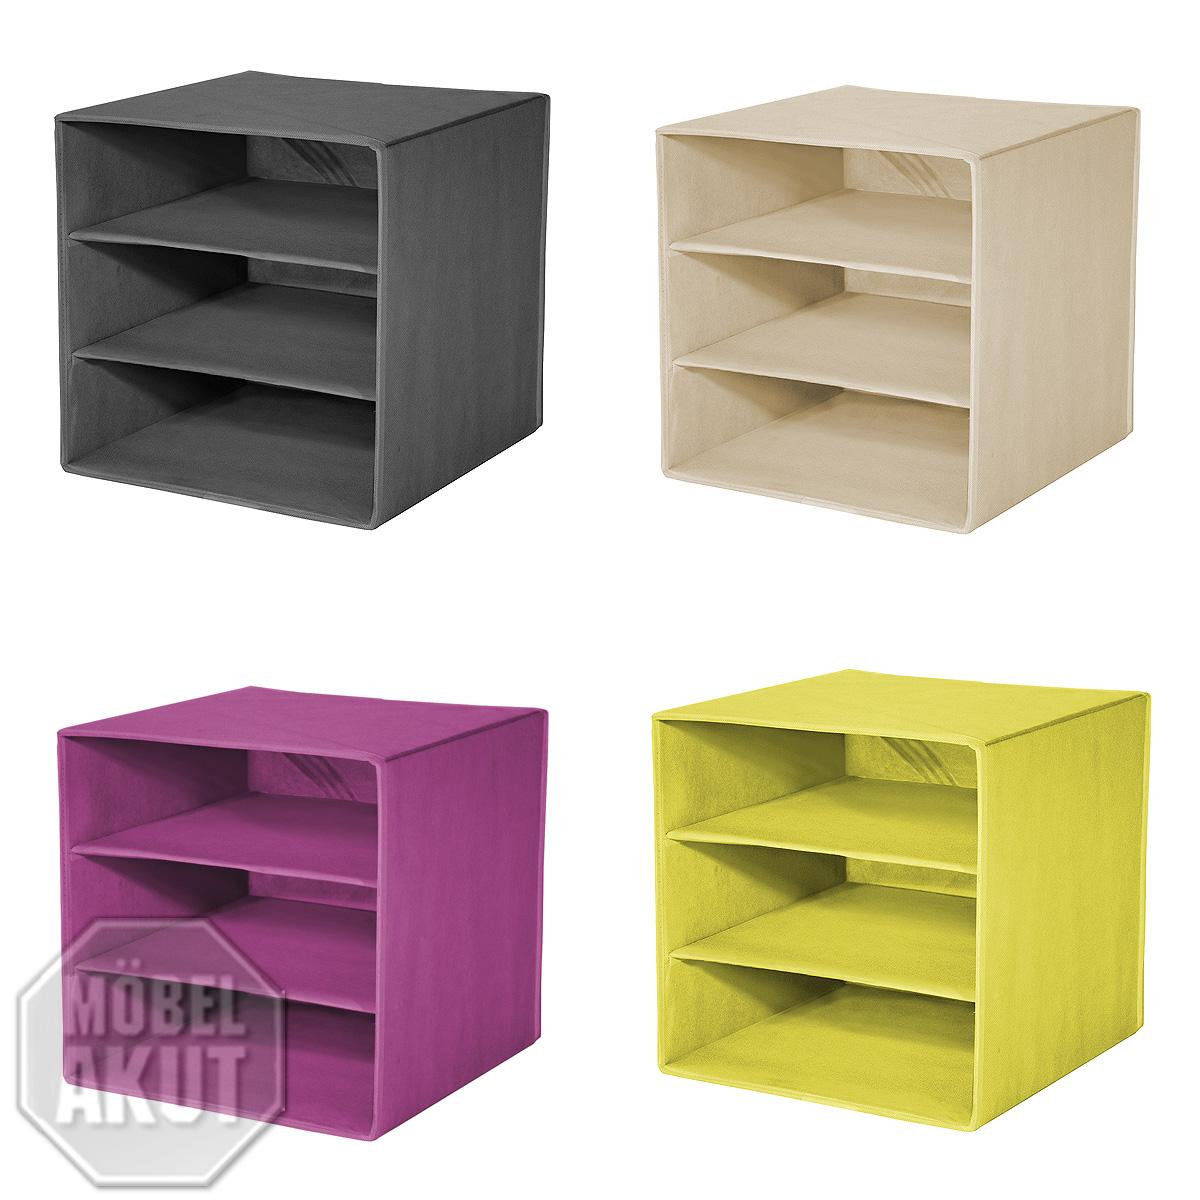 faltbox alfa 5 korb regal ablage mit farbauswahl ebay. Black Bedroom Furniture Sets. Home Design Ideas